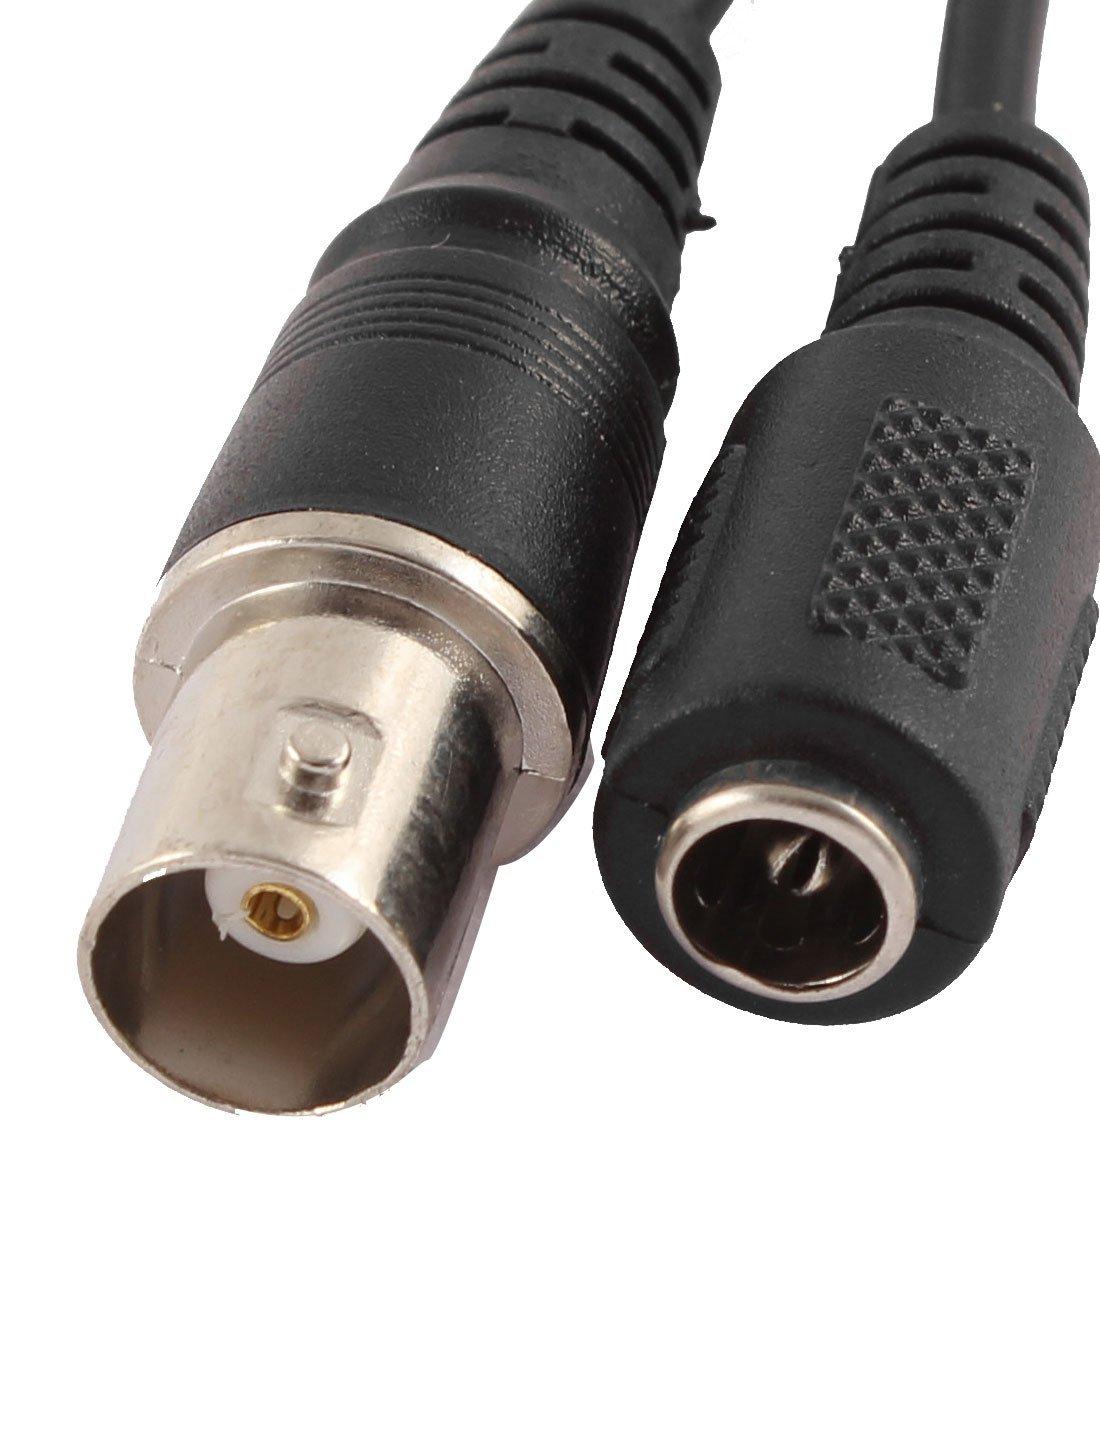 5.5x2.1m m eDealMax BNC hembra conector de alimentación DC a 5 alambre CCTV cable de la cámara Negro - - Amazon.com